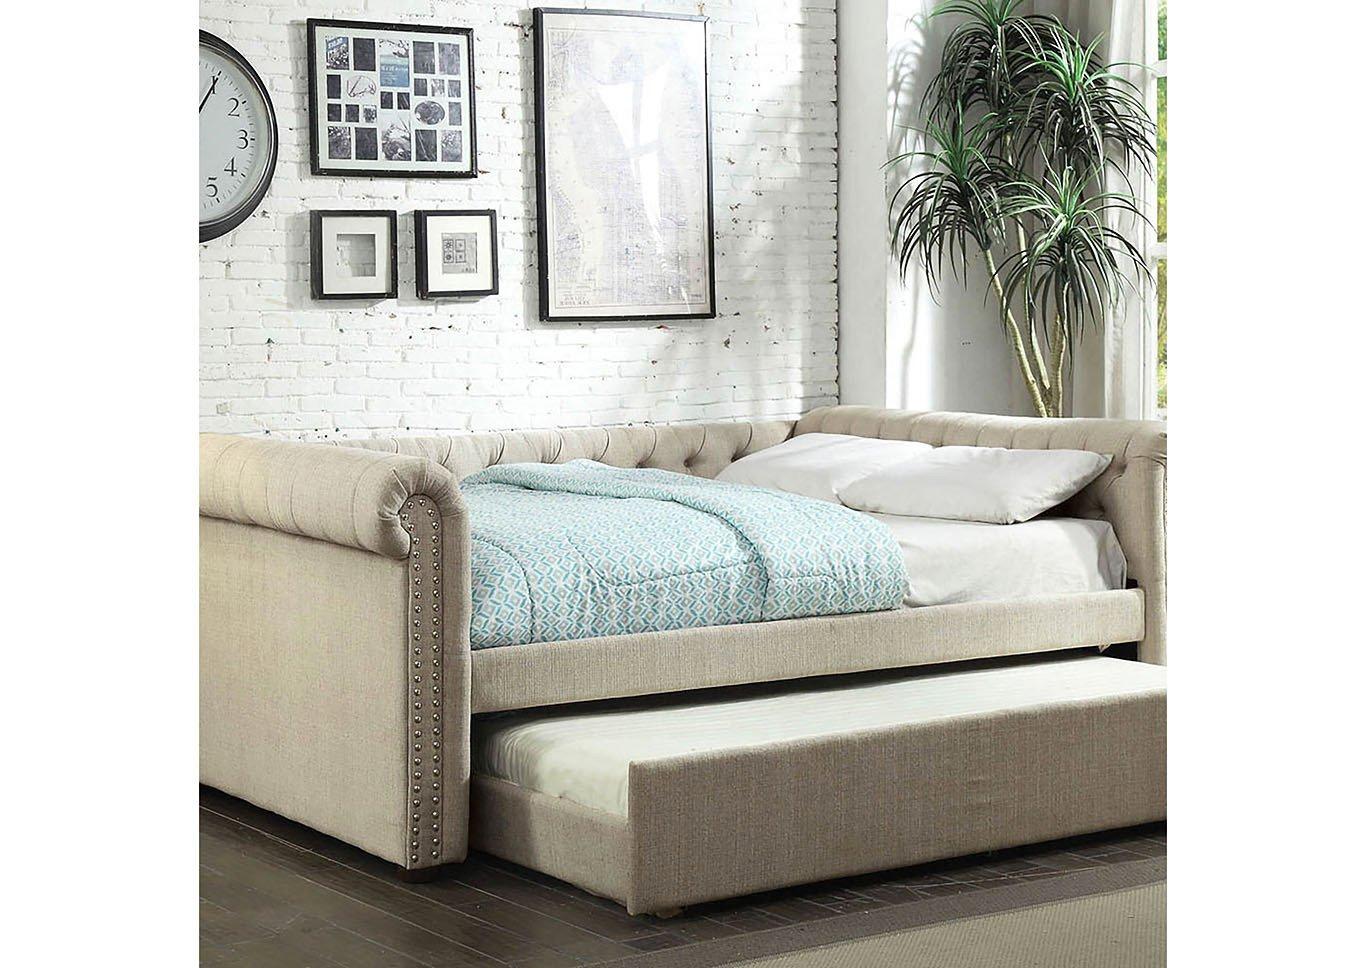 Twin Trundle Bedroom Set Unique Sans Midman Furniture Leanna Beige Queen Daybed W Trundle